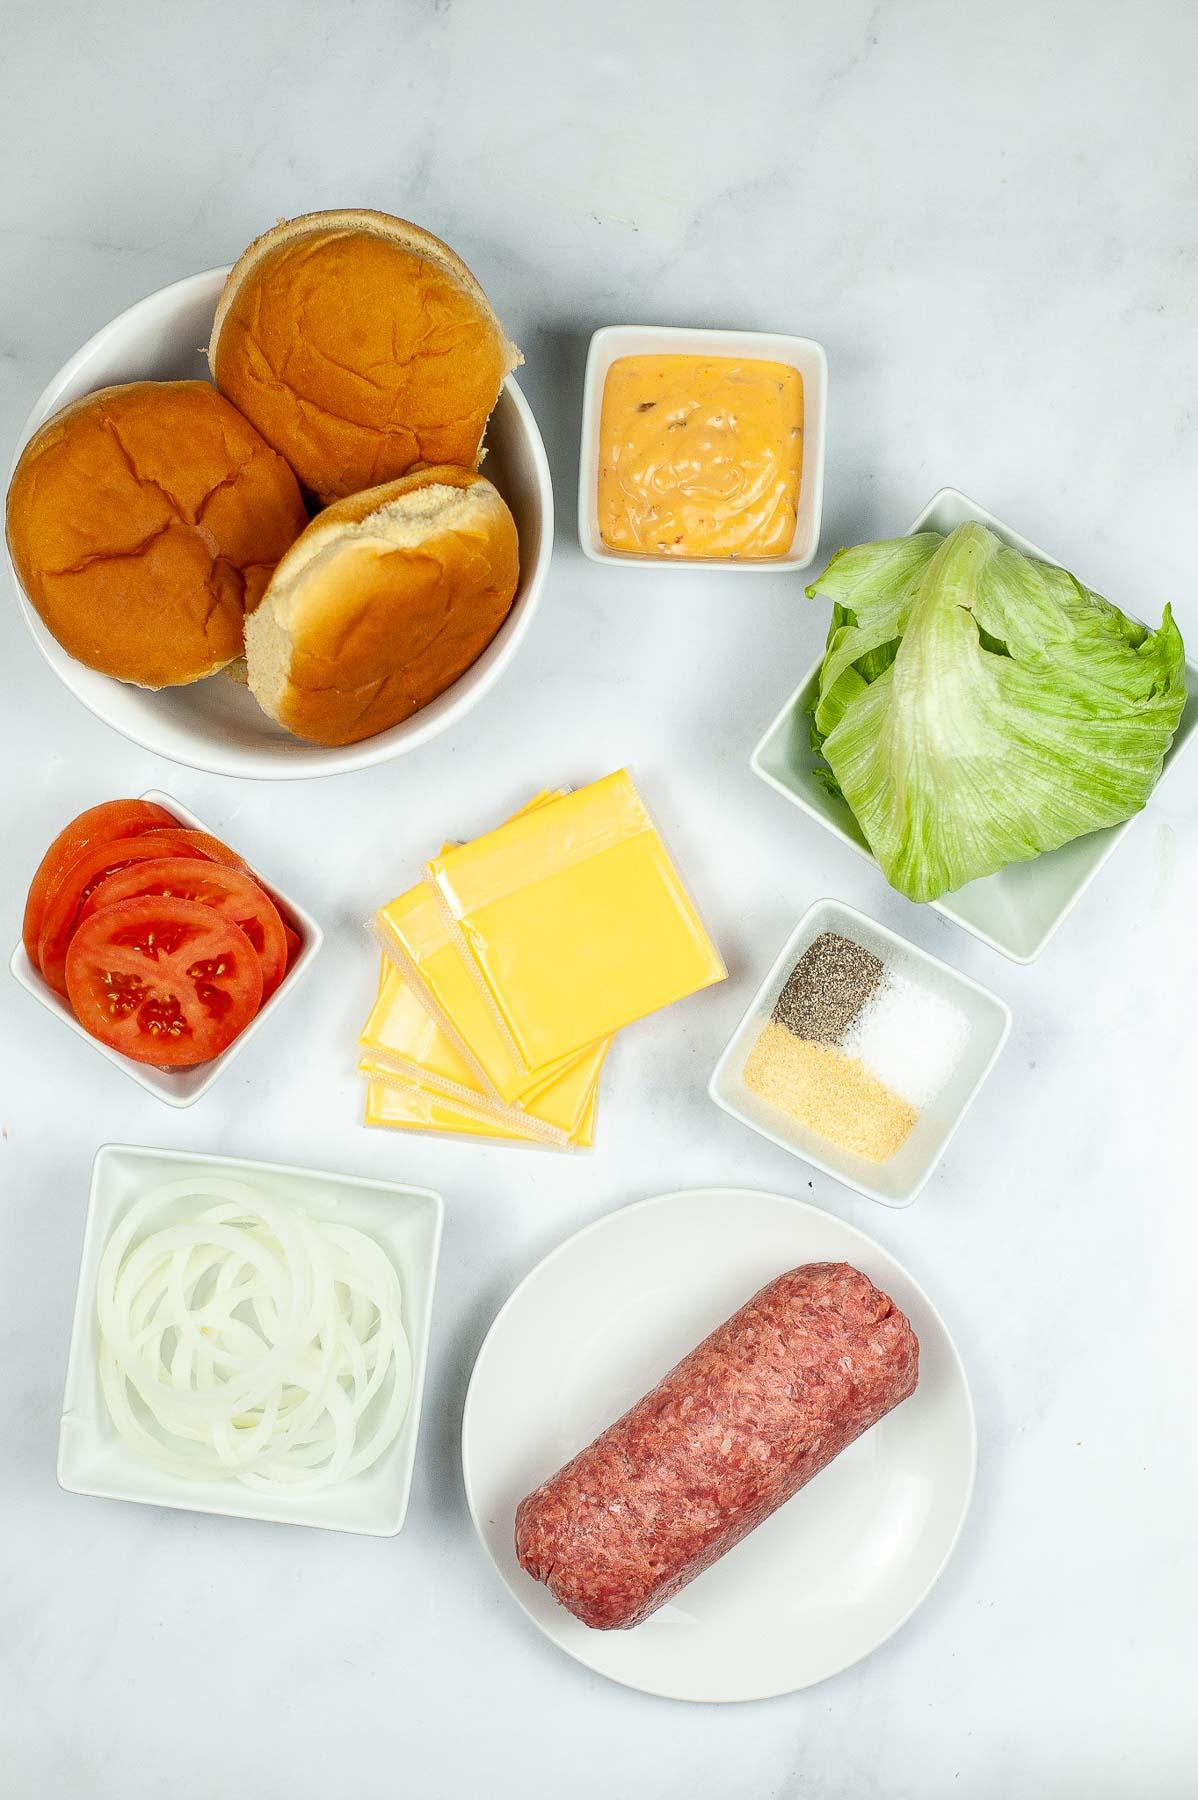 Ingredients to make Copycat In N Out Burgers.